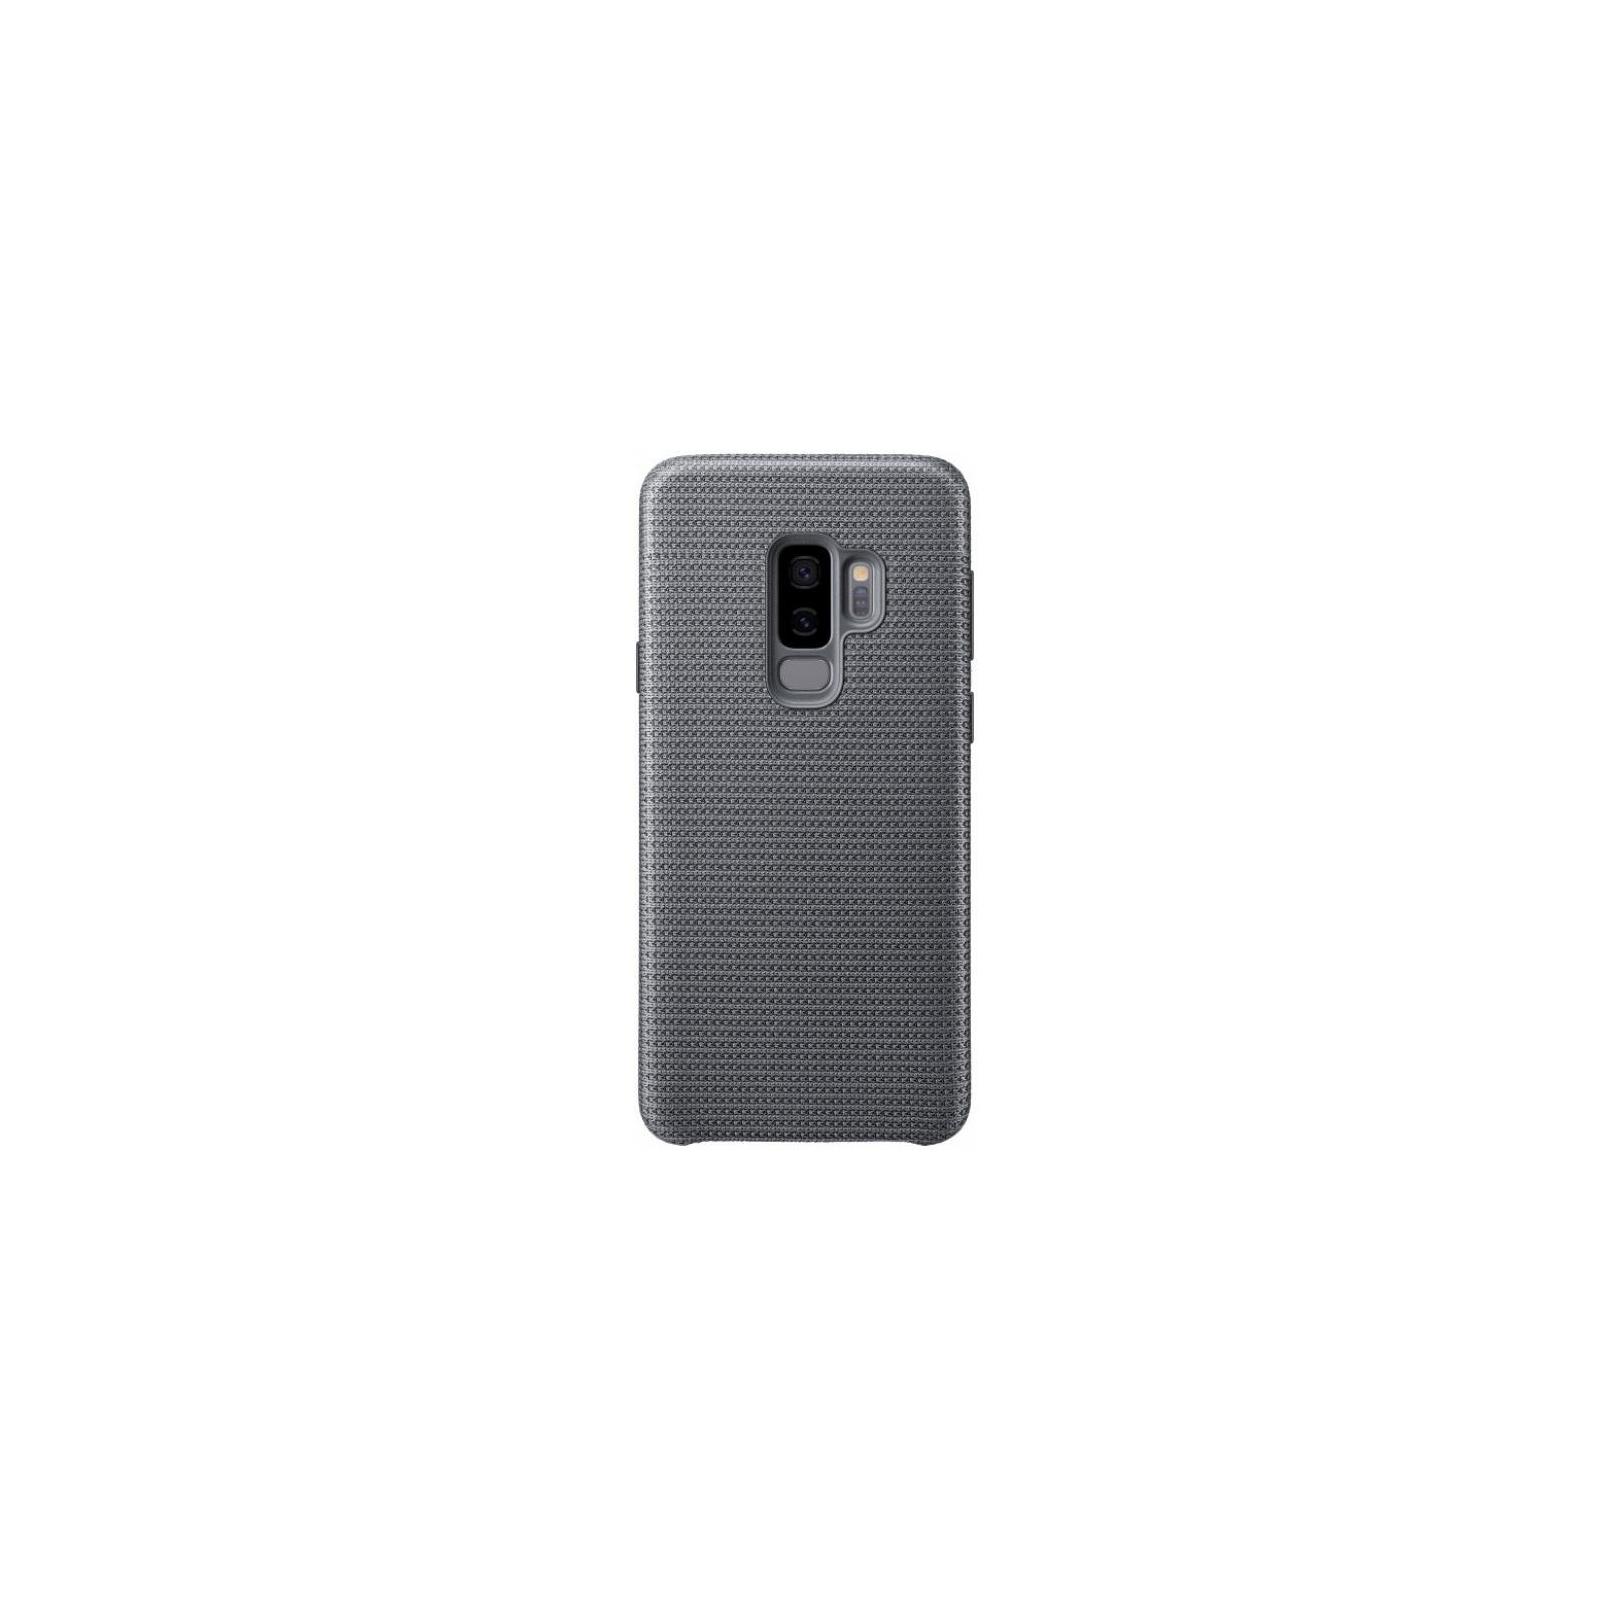 Чехол для моб. телефона Samsung для Galaxy S9+ (G965) Hyperknit Cover Grey (EF-GG965FJEGRU) изображение 3